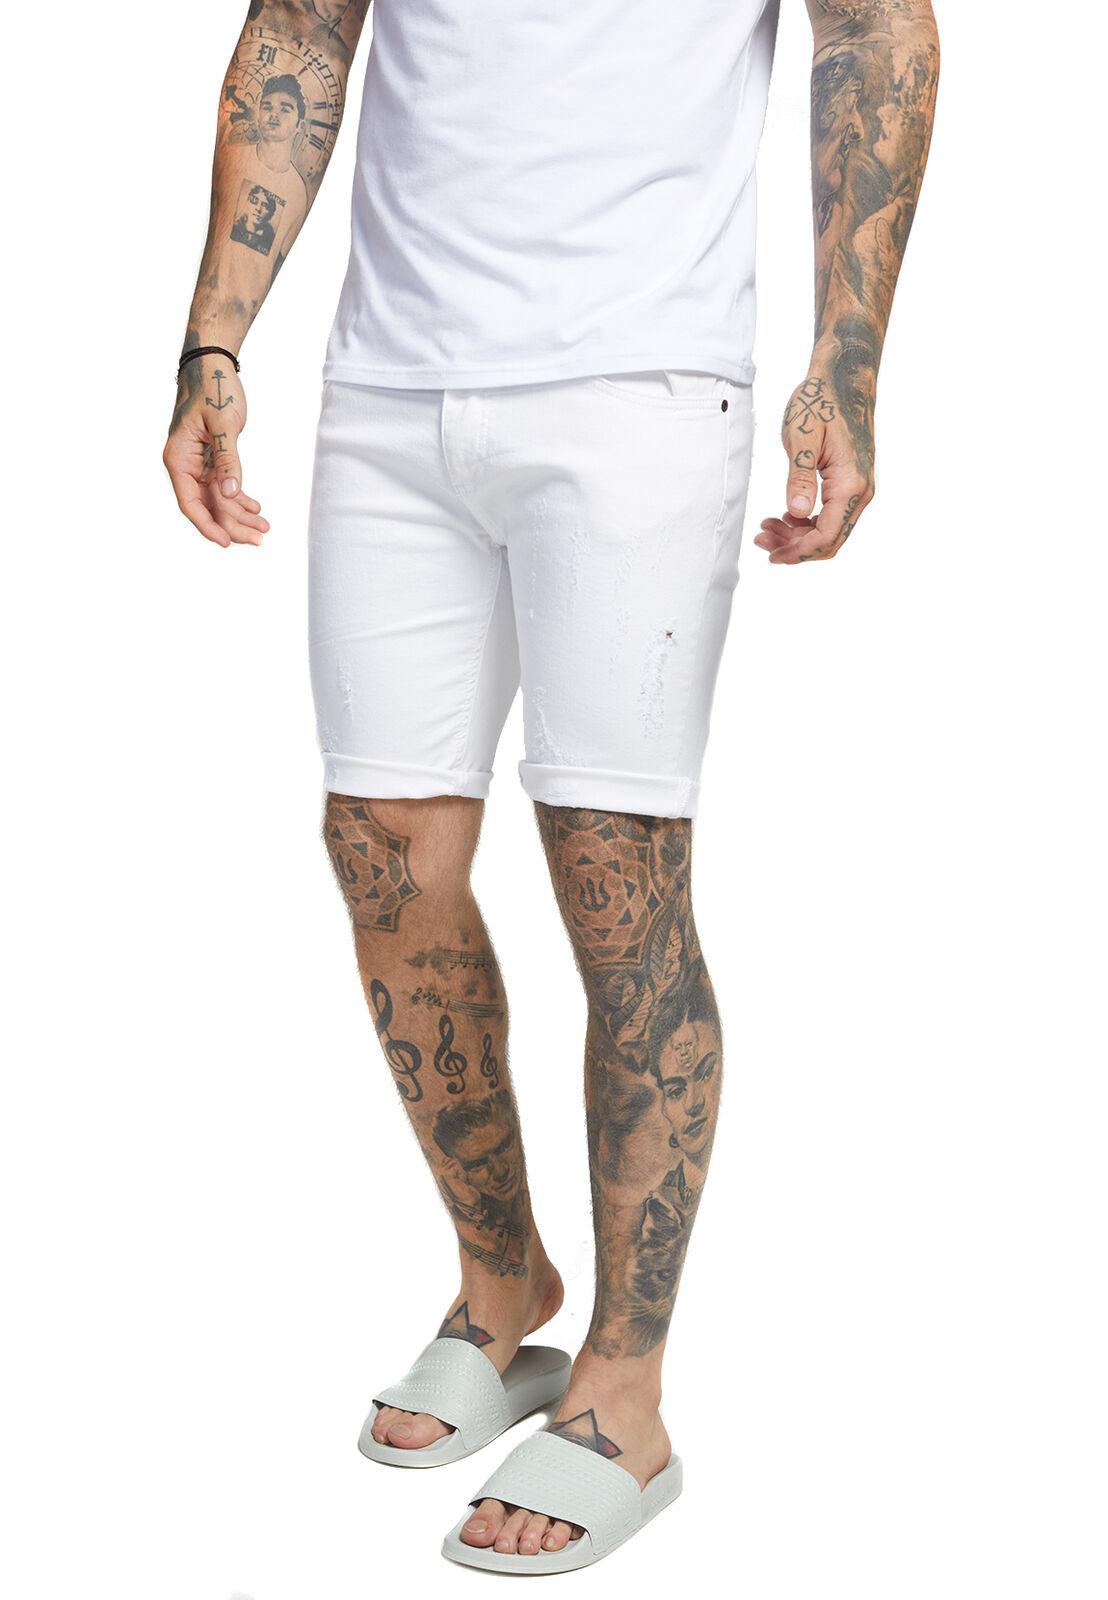 SikSilk Herren Jeans Short DISTRESSED SKINNY SHORTS SS-13009 Weiß